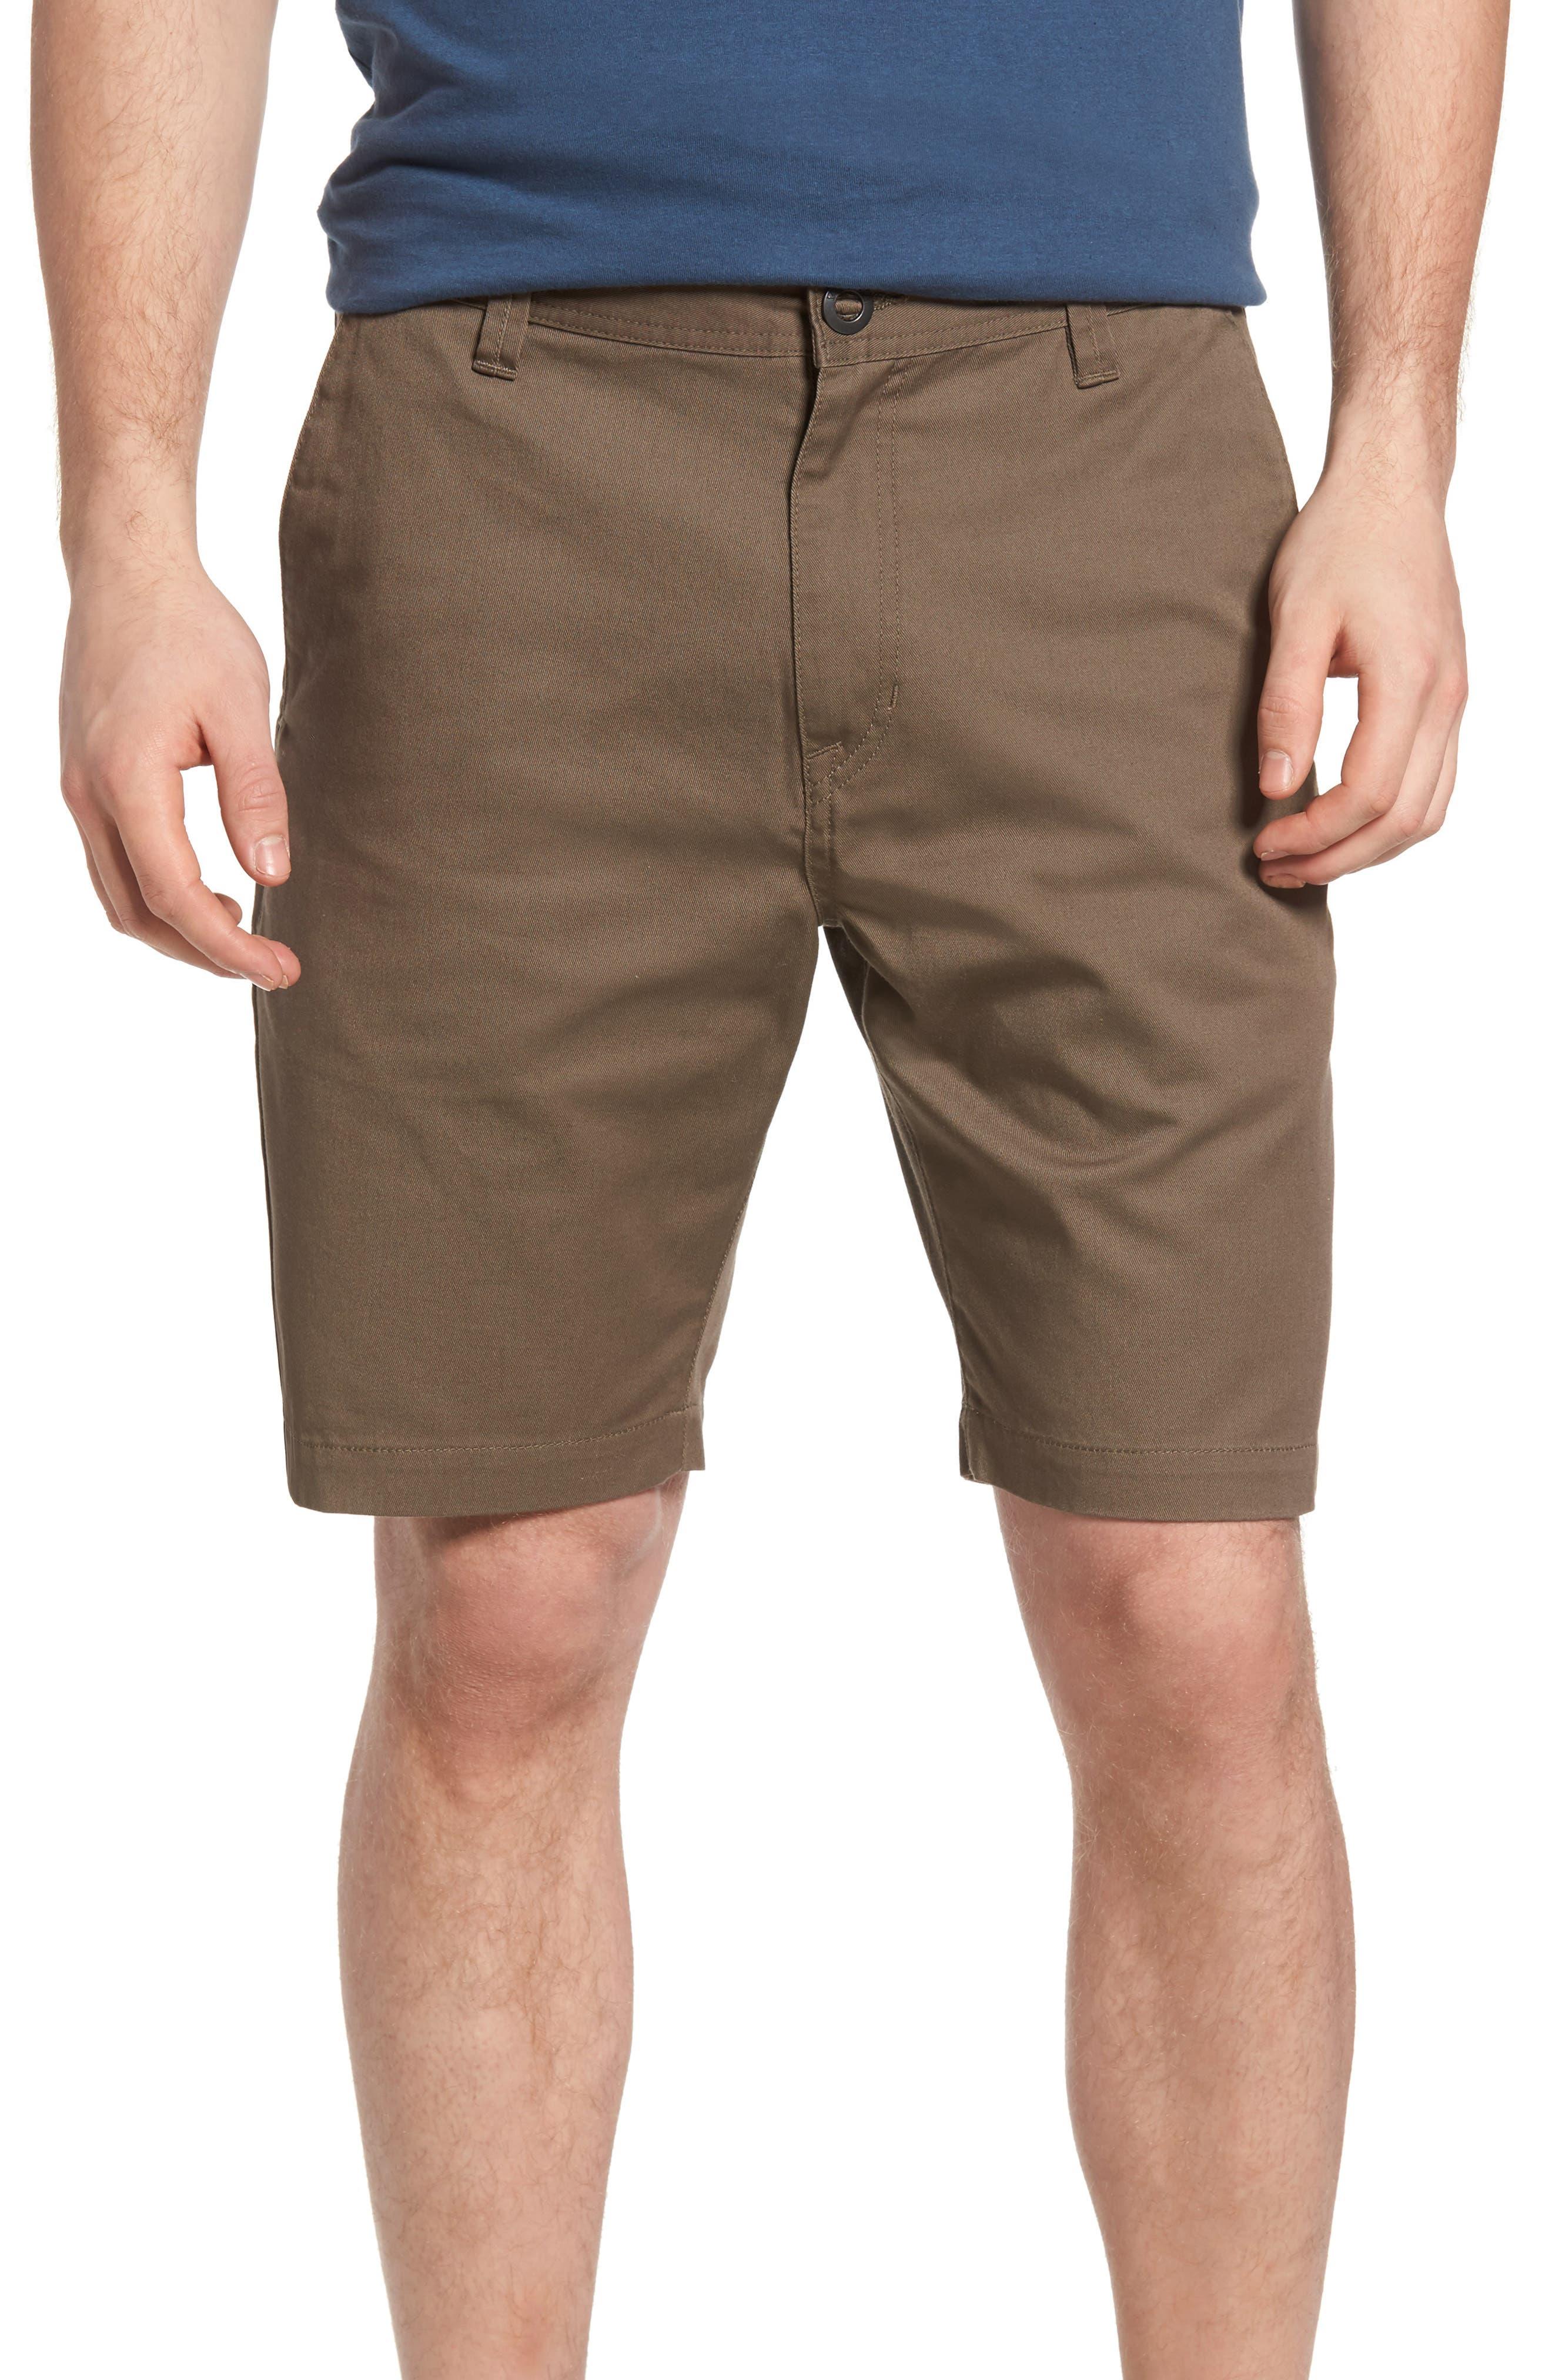 Drifter Modern Chino Shorts,                         Main,                         color, Mushroom